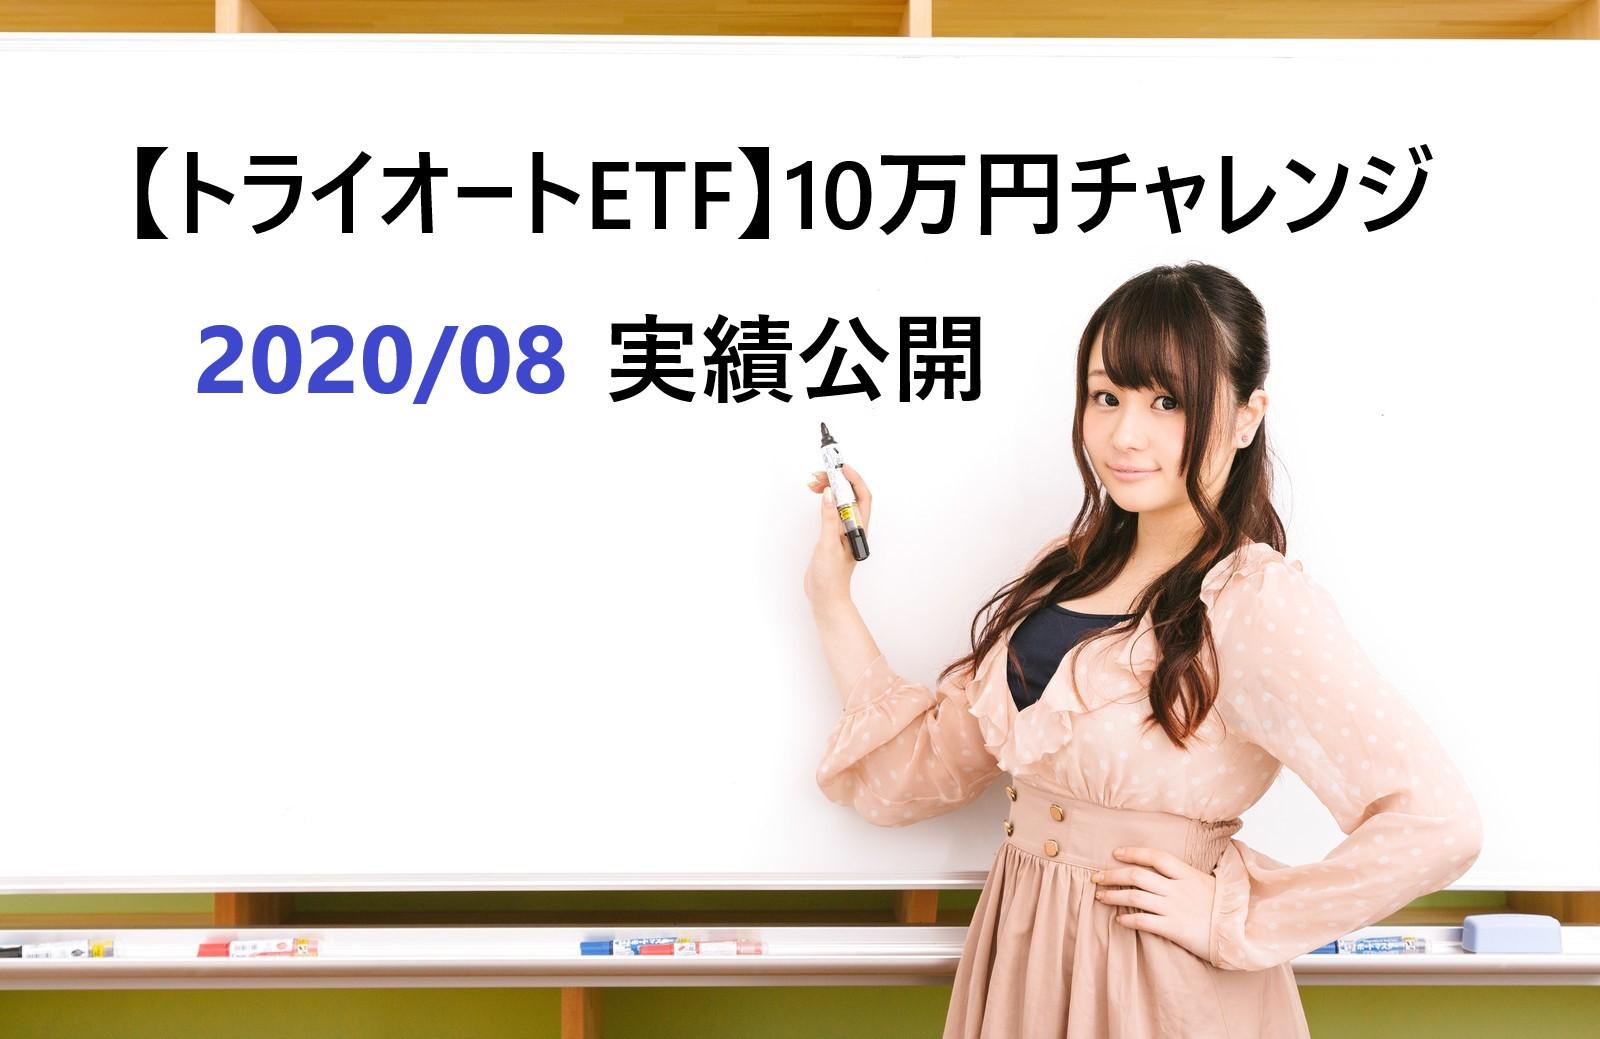 triauto-etf-challenge-202008